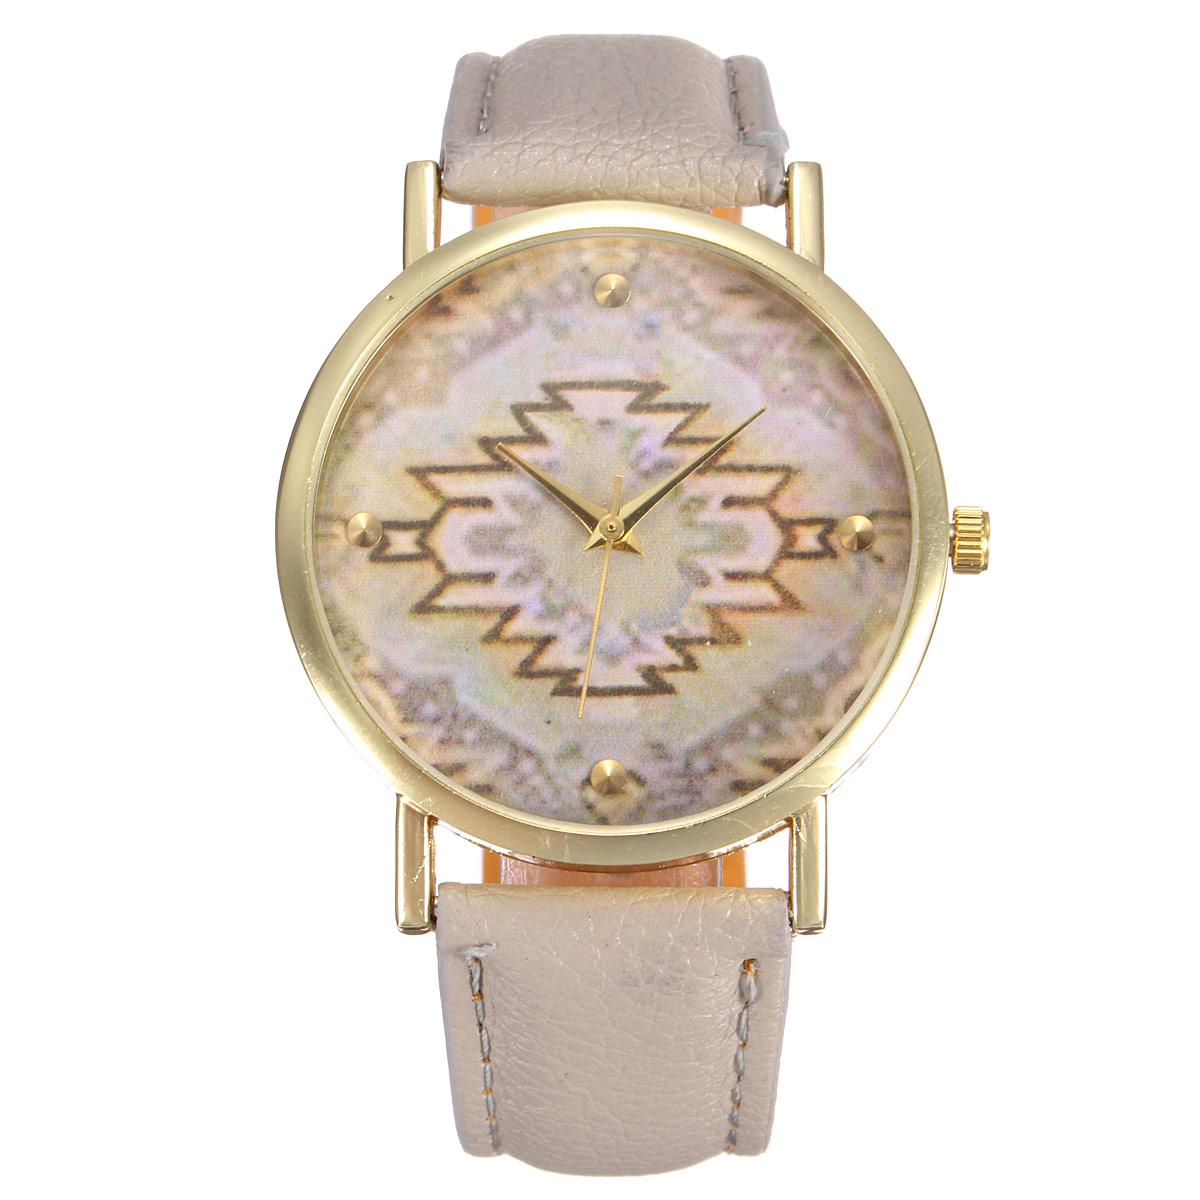 Fashion vintage Leather Geometric Wave Watch Women Dress Quartz Watches Gift